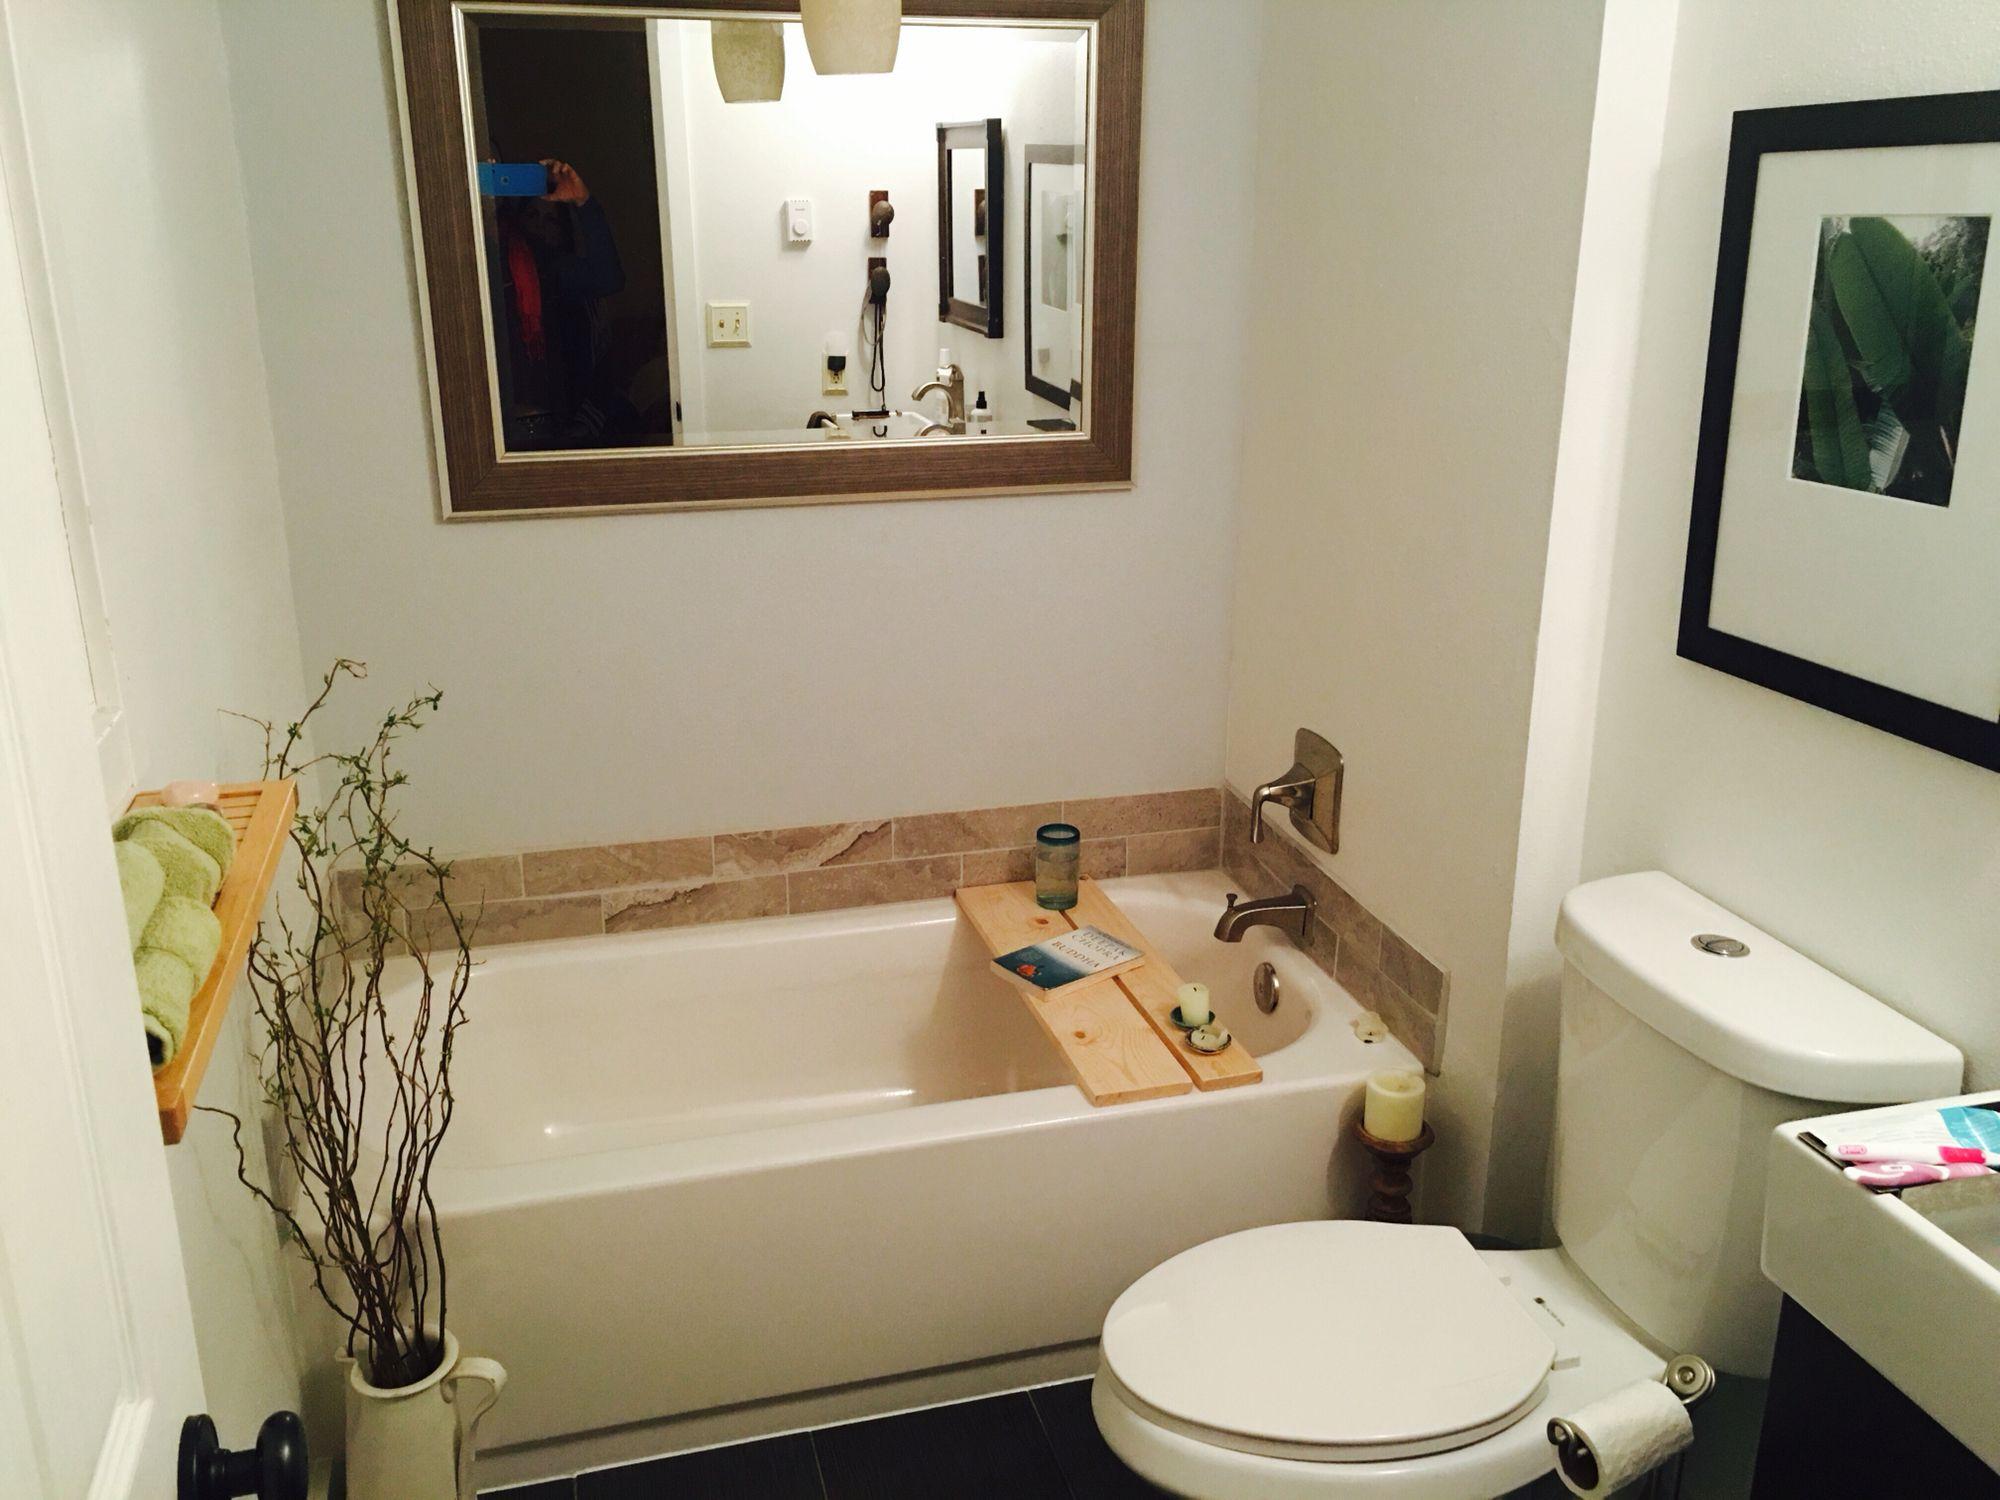 70s Split Level Bathroom Remodel Bathrooms Remodel Bathroom Renovation Price Bathroom Vanities Without Tops